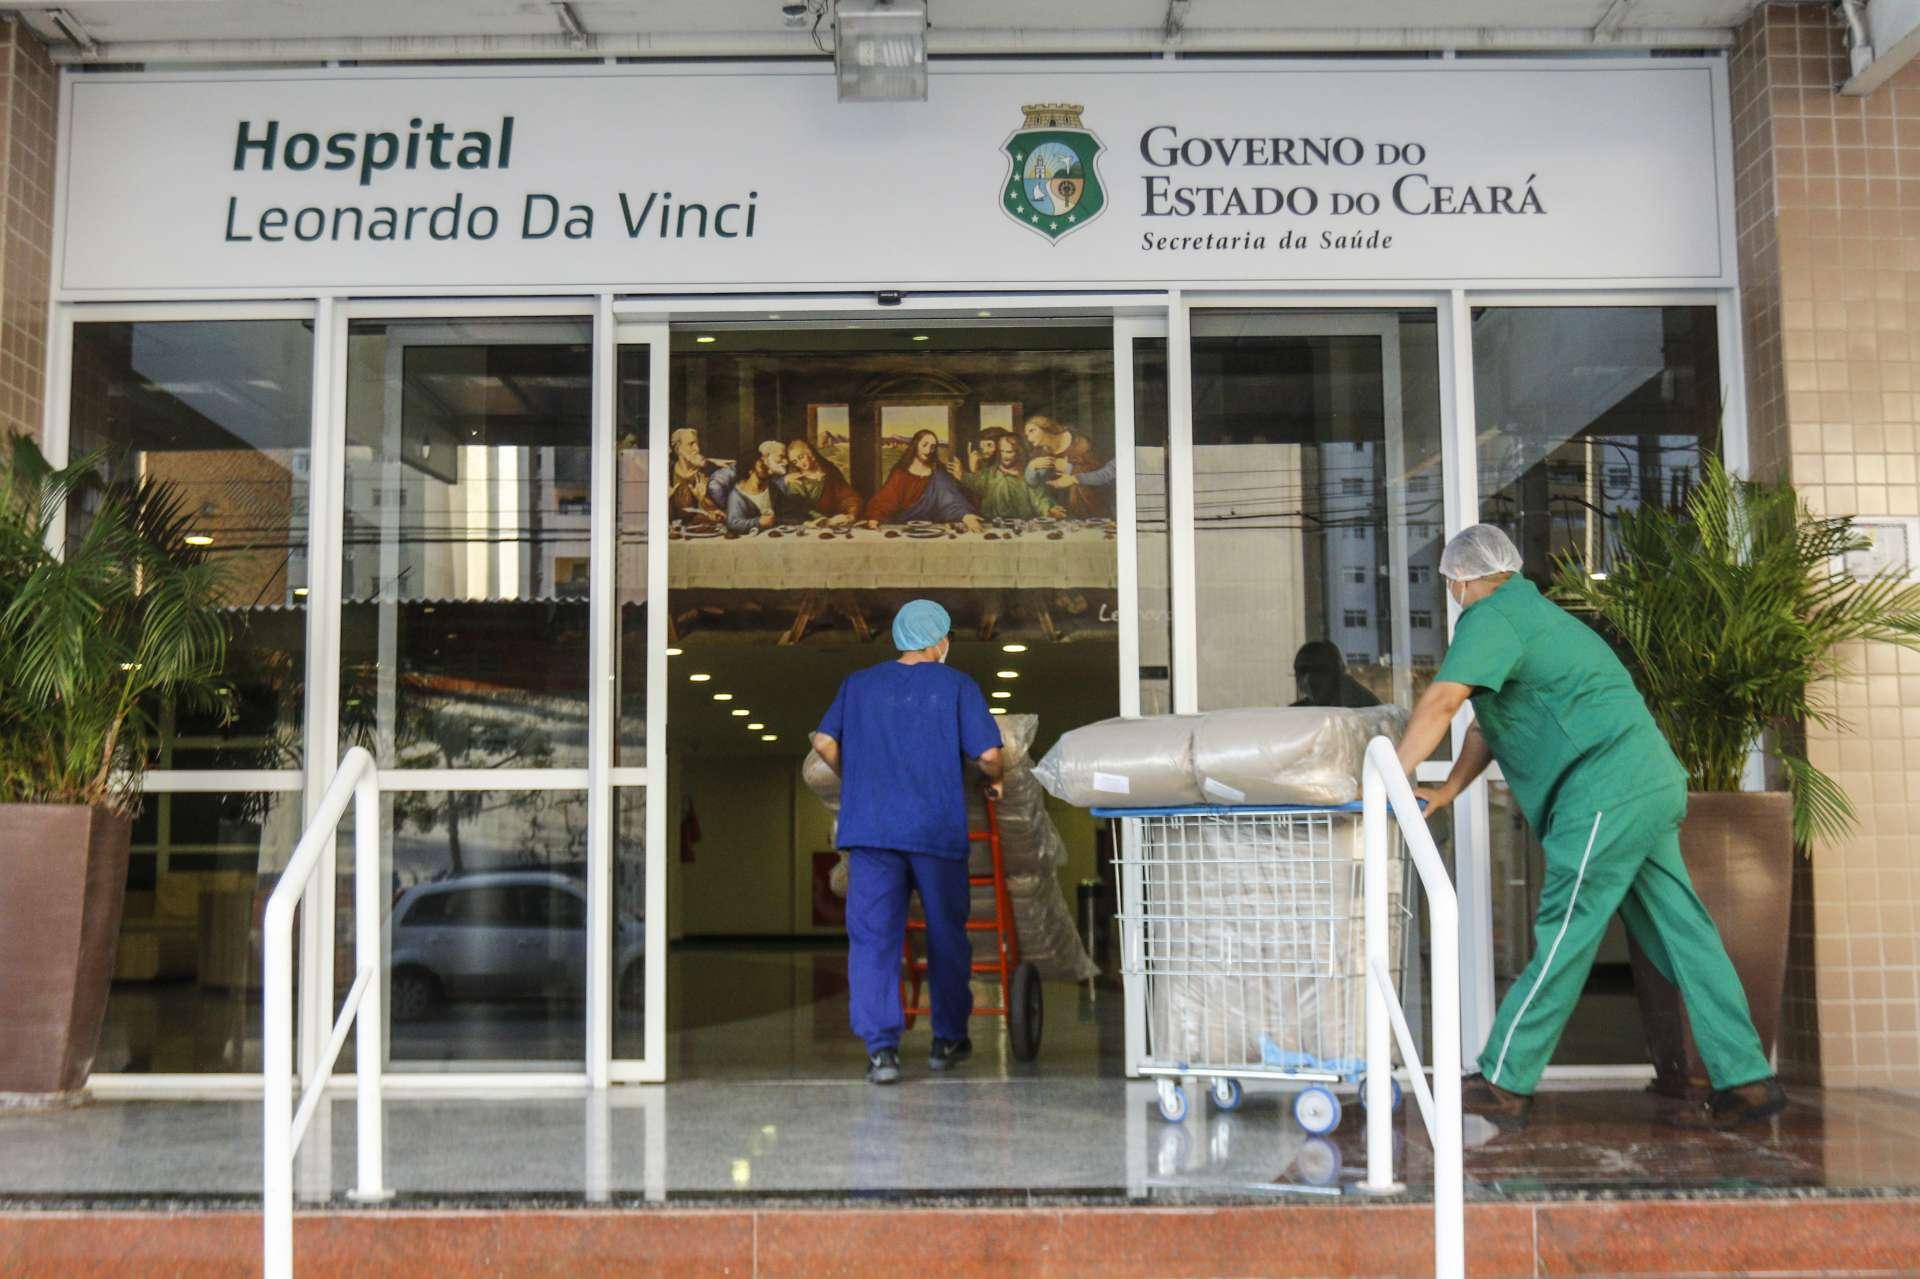 Hospital Leonardo da Vinci, Aldeota, Fortaleza